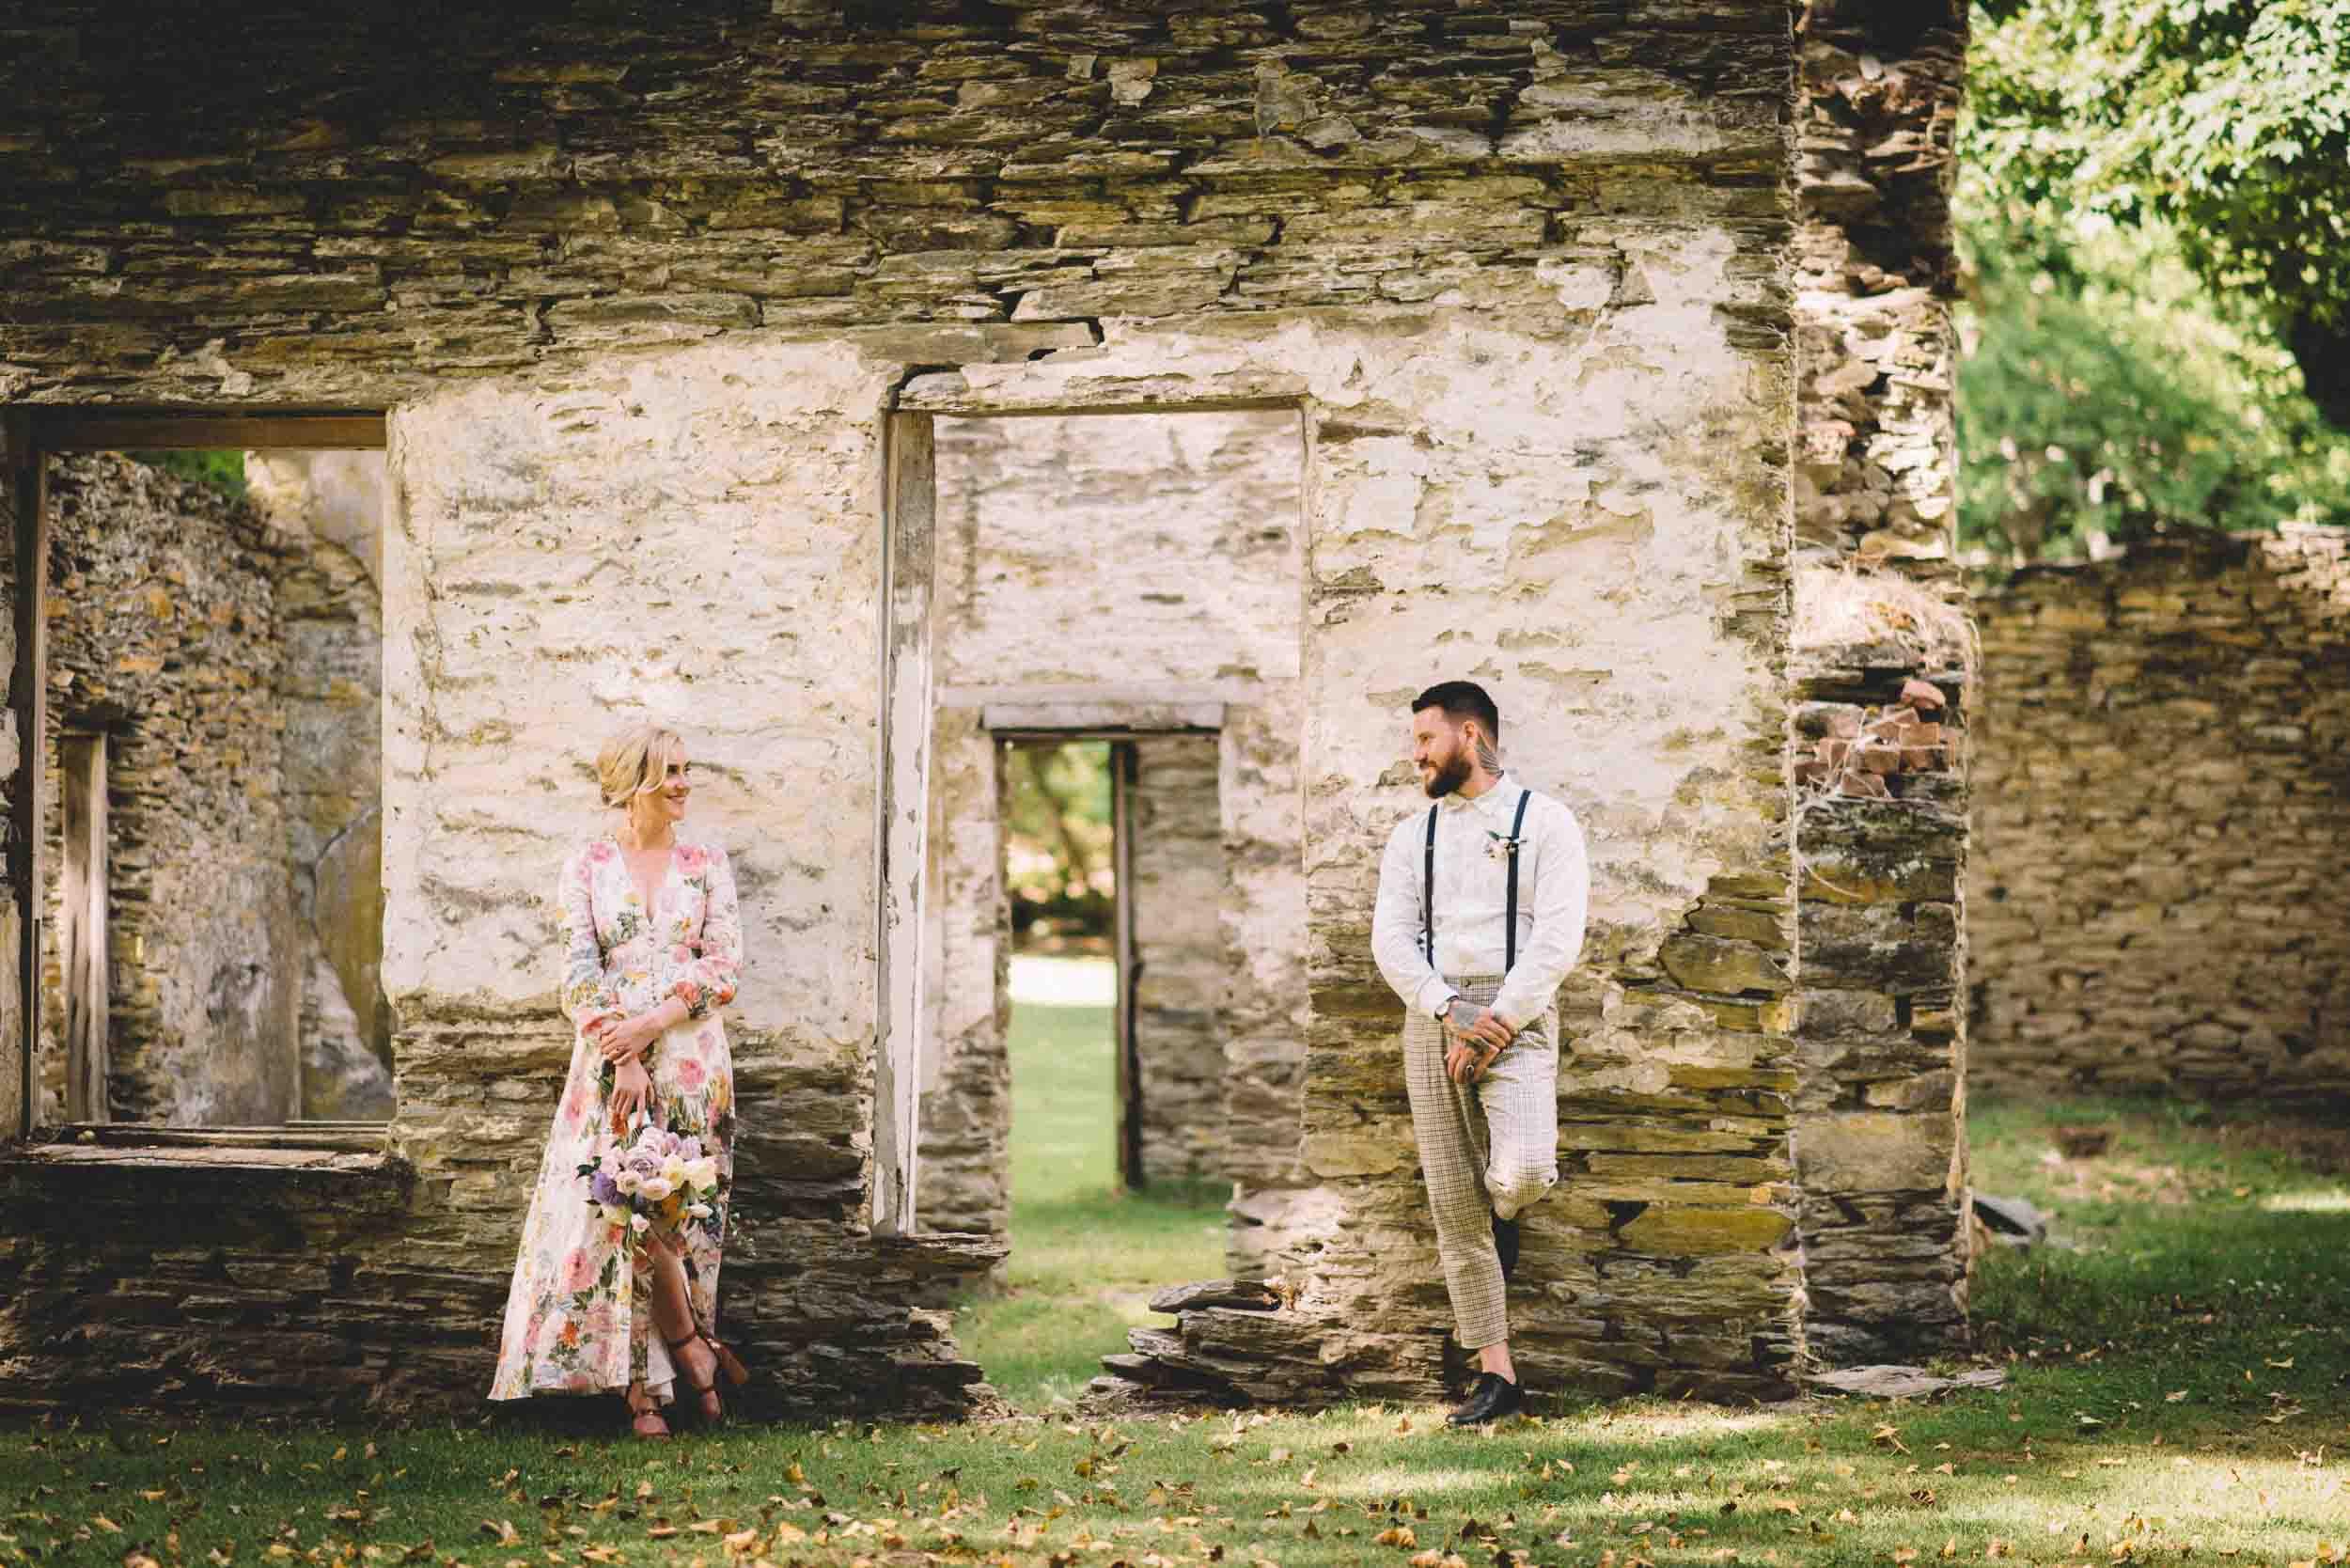 Nick & Nina's Thurlby Domain Elopement bride & groom photos old stone ruins